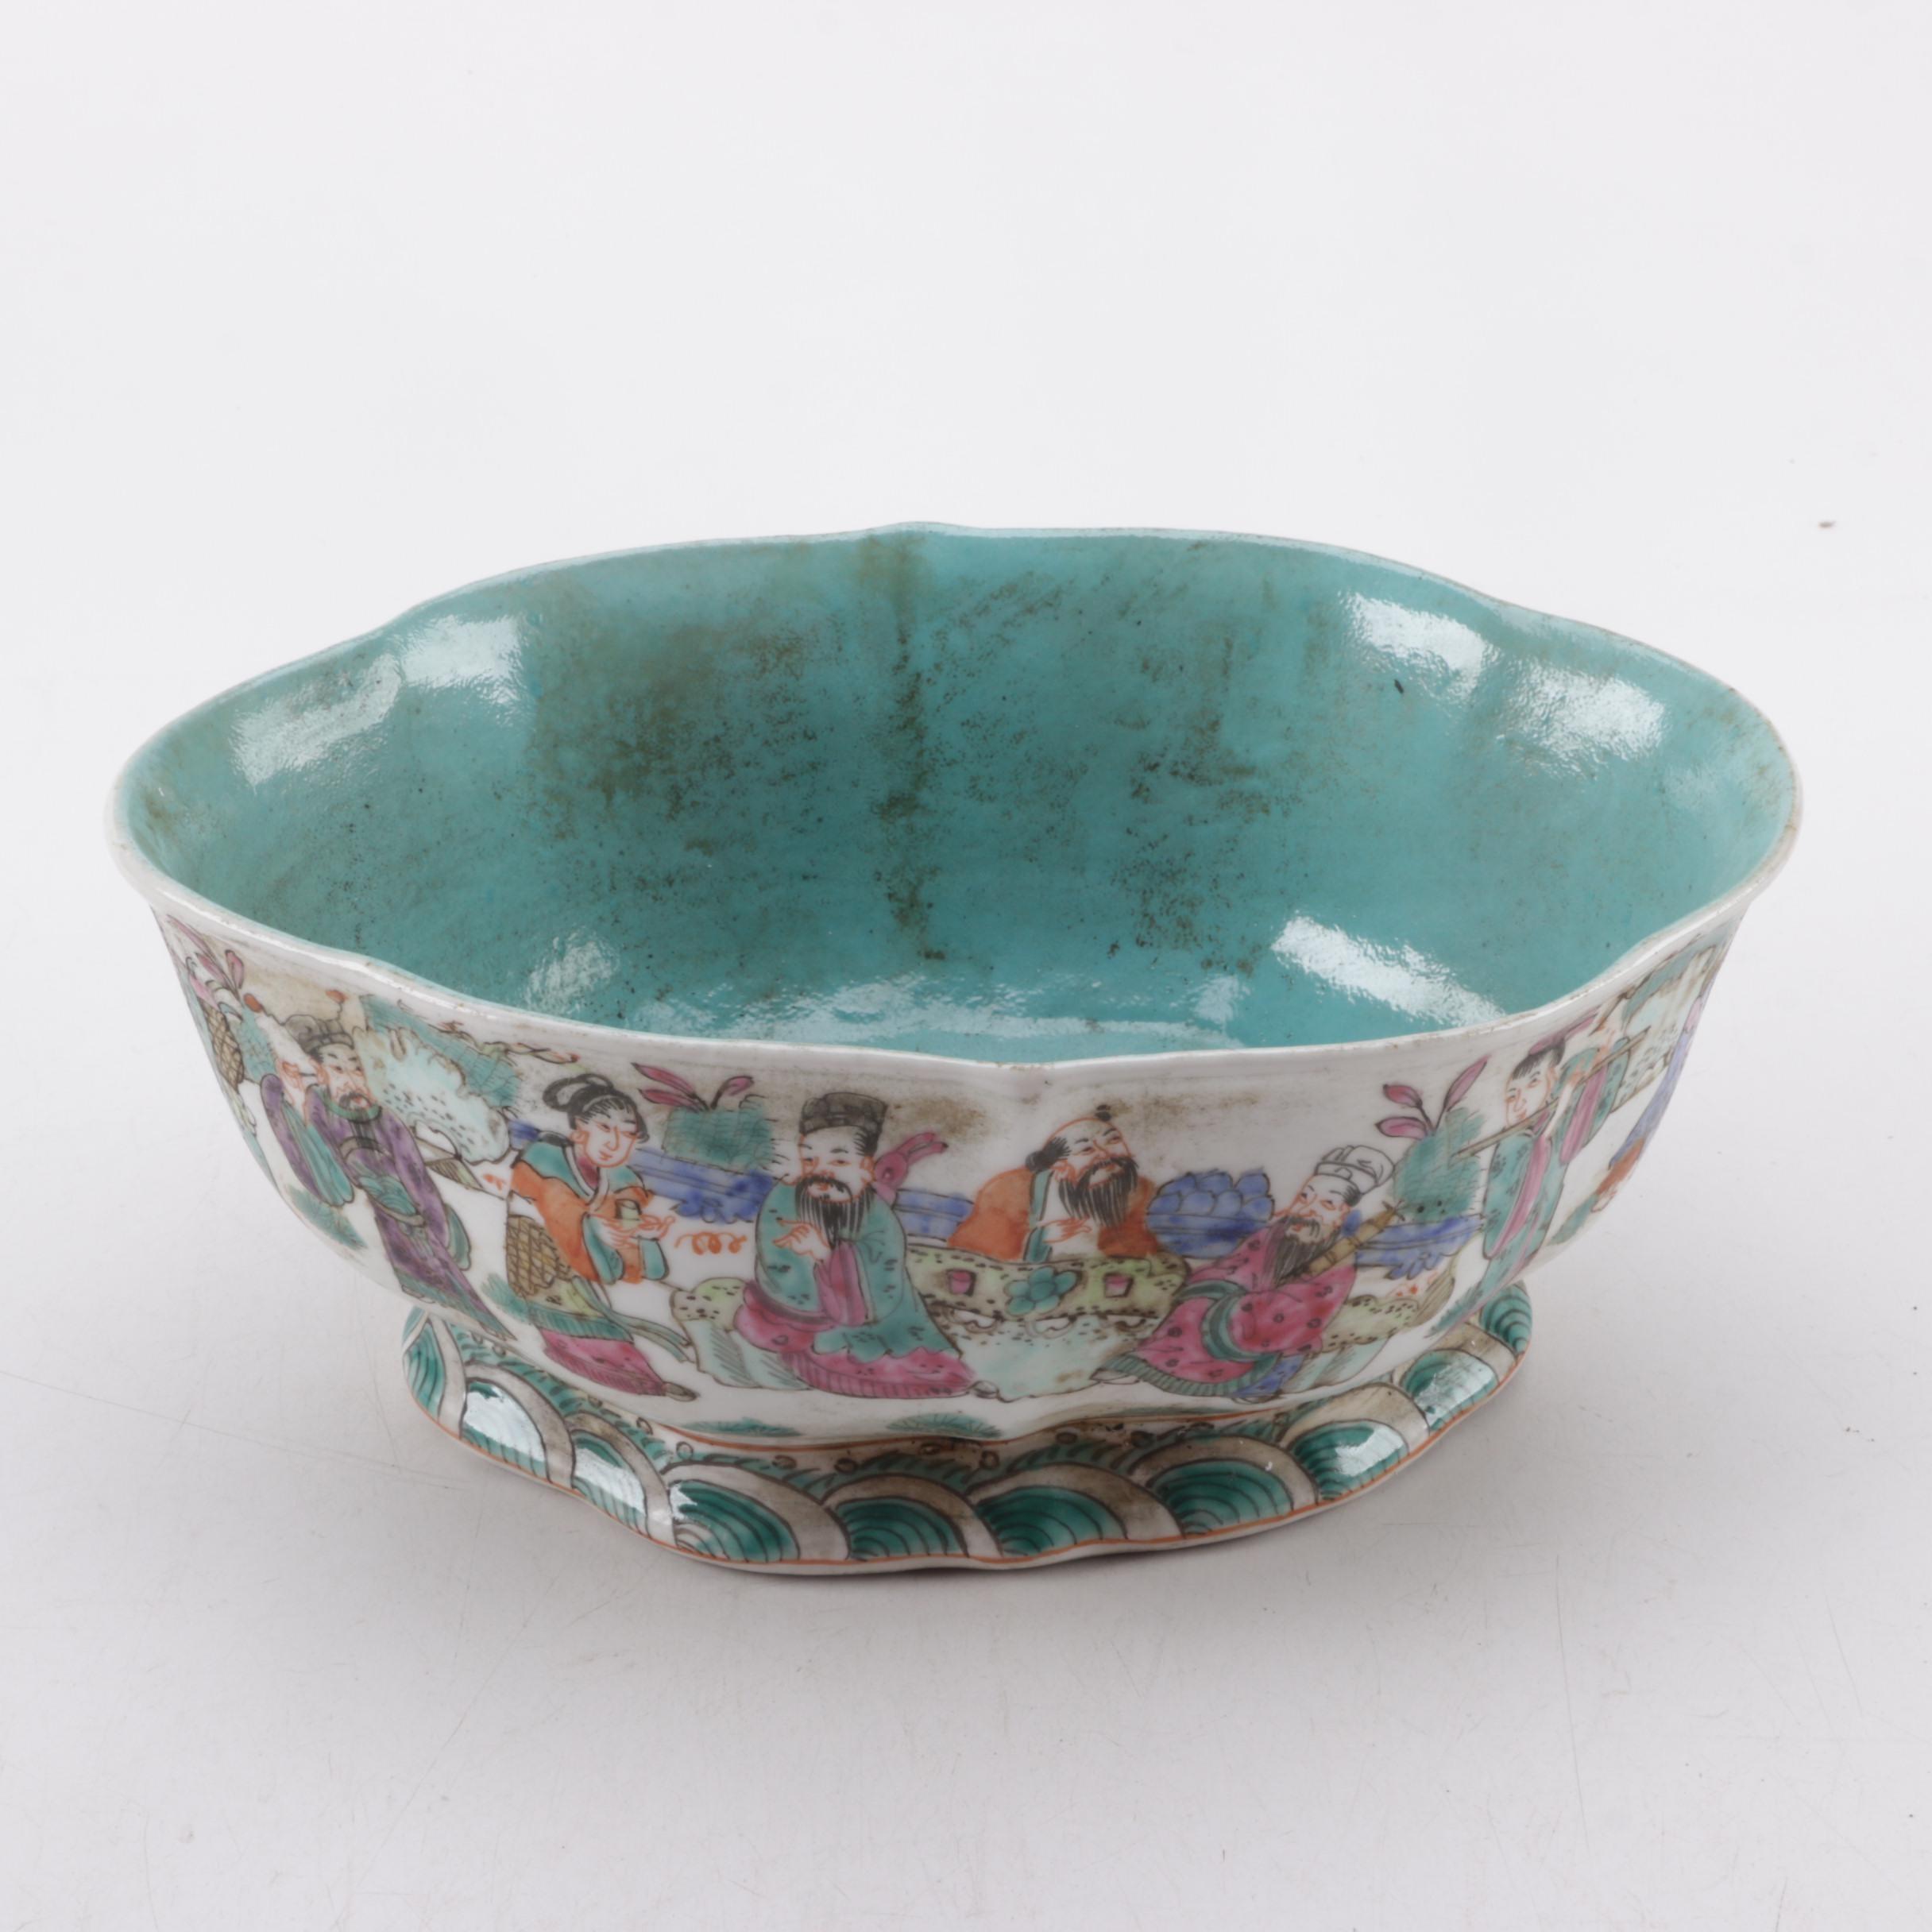 19th Century Chinese Lotus Shaped Porcelain Bowl